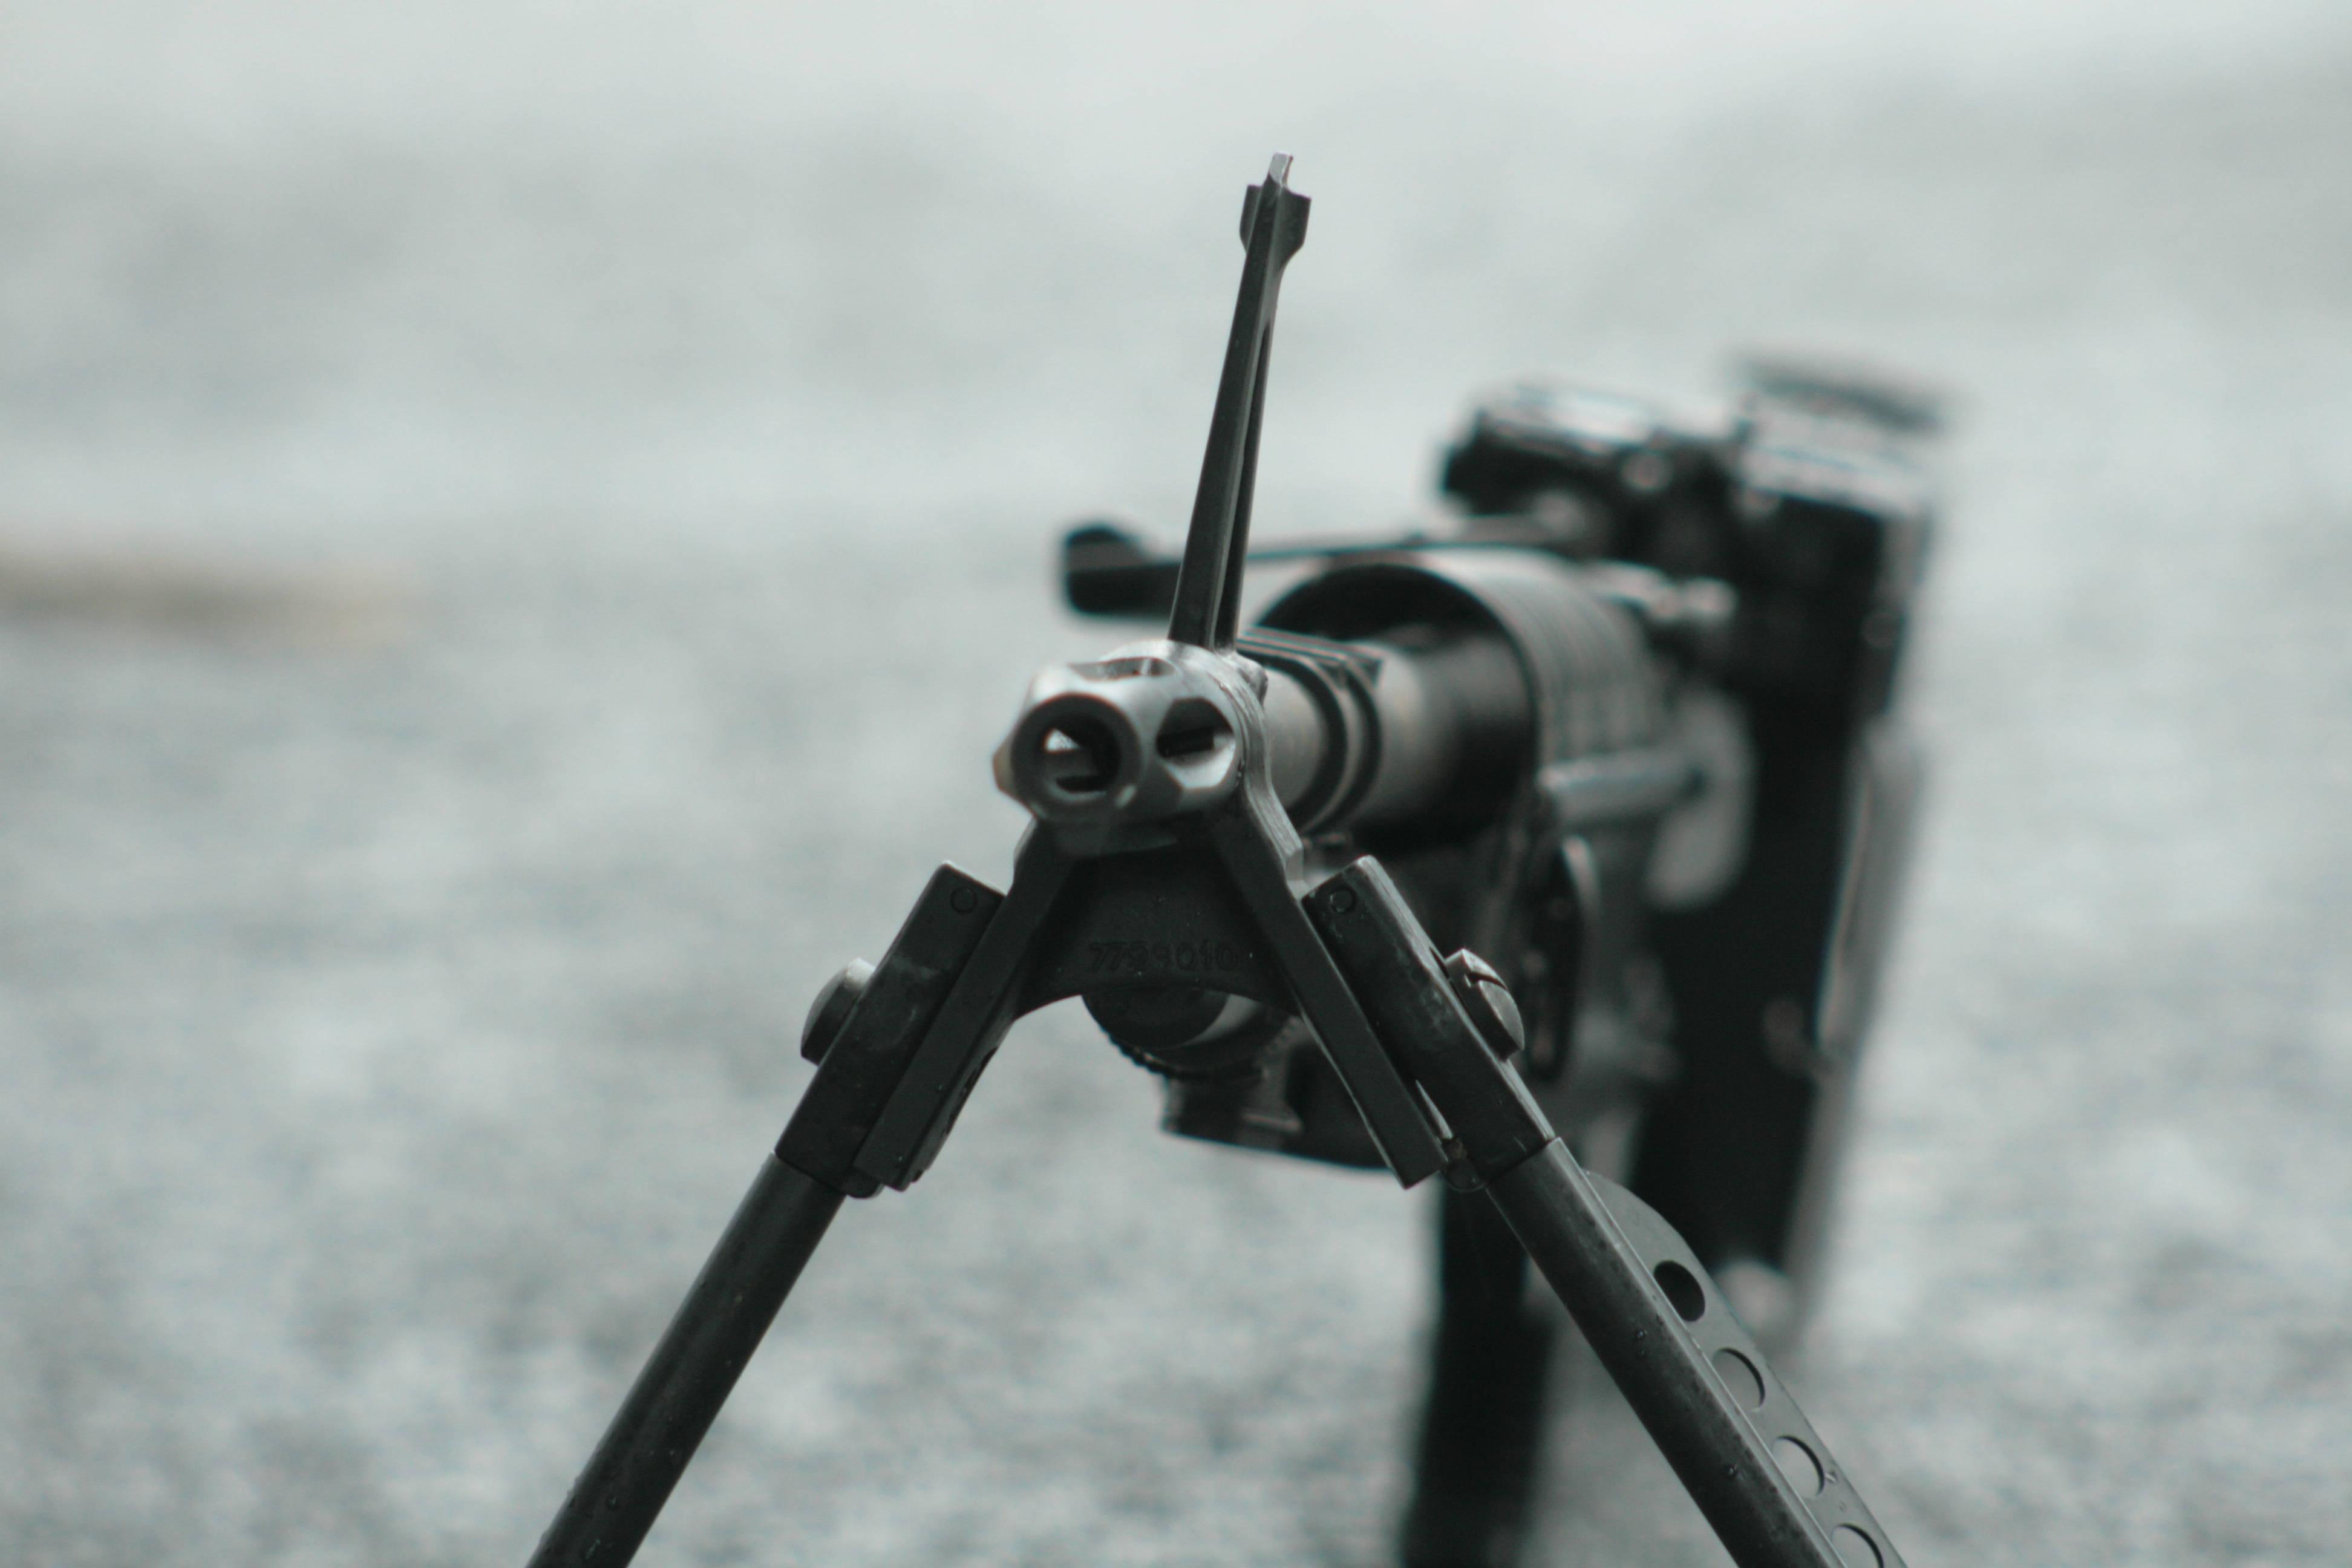 Machine Gun 38882592 Wallpaper 776049 3888x2592